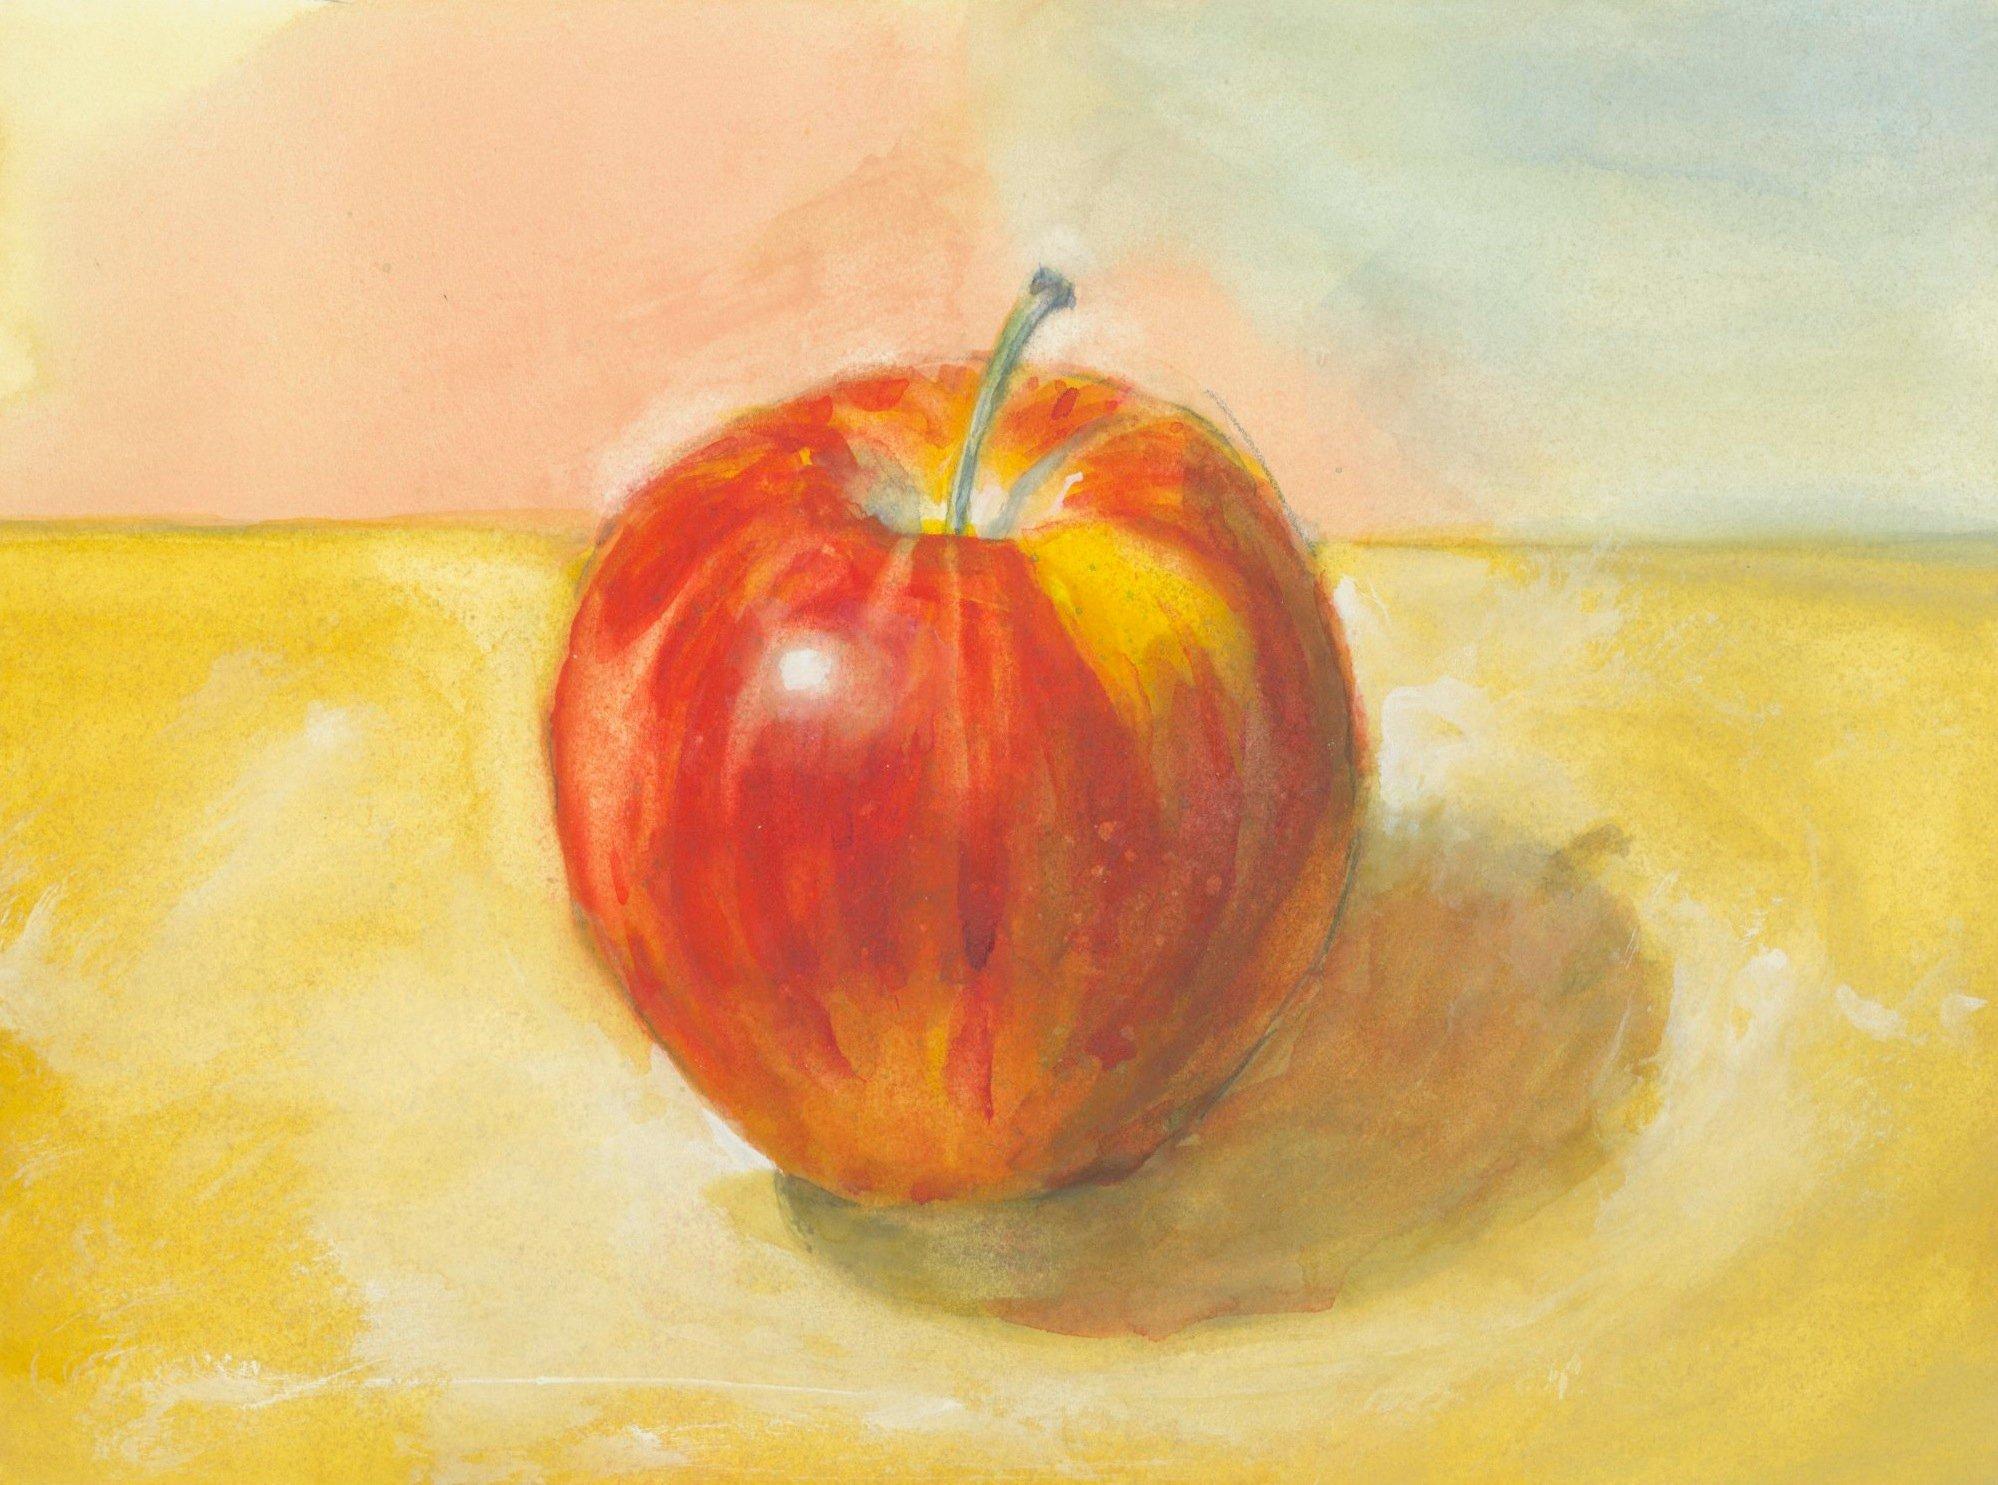 gala apple copy.jpg